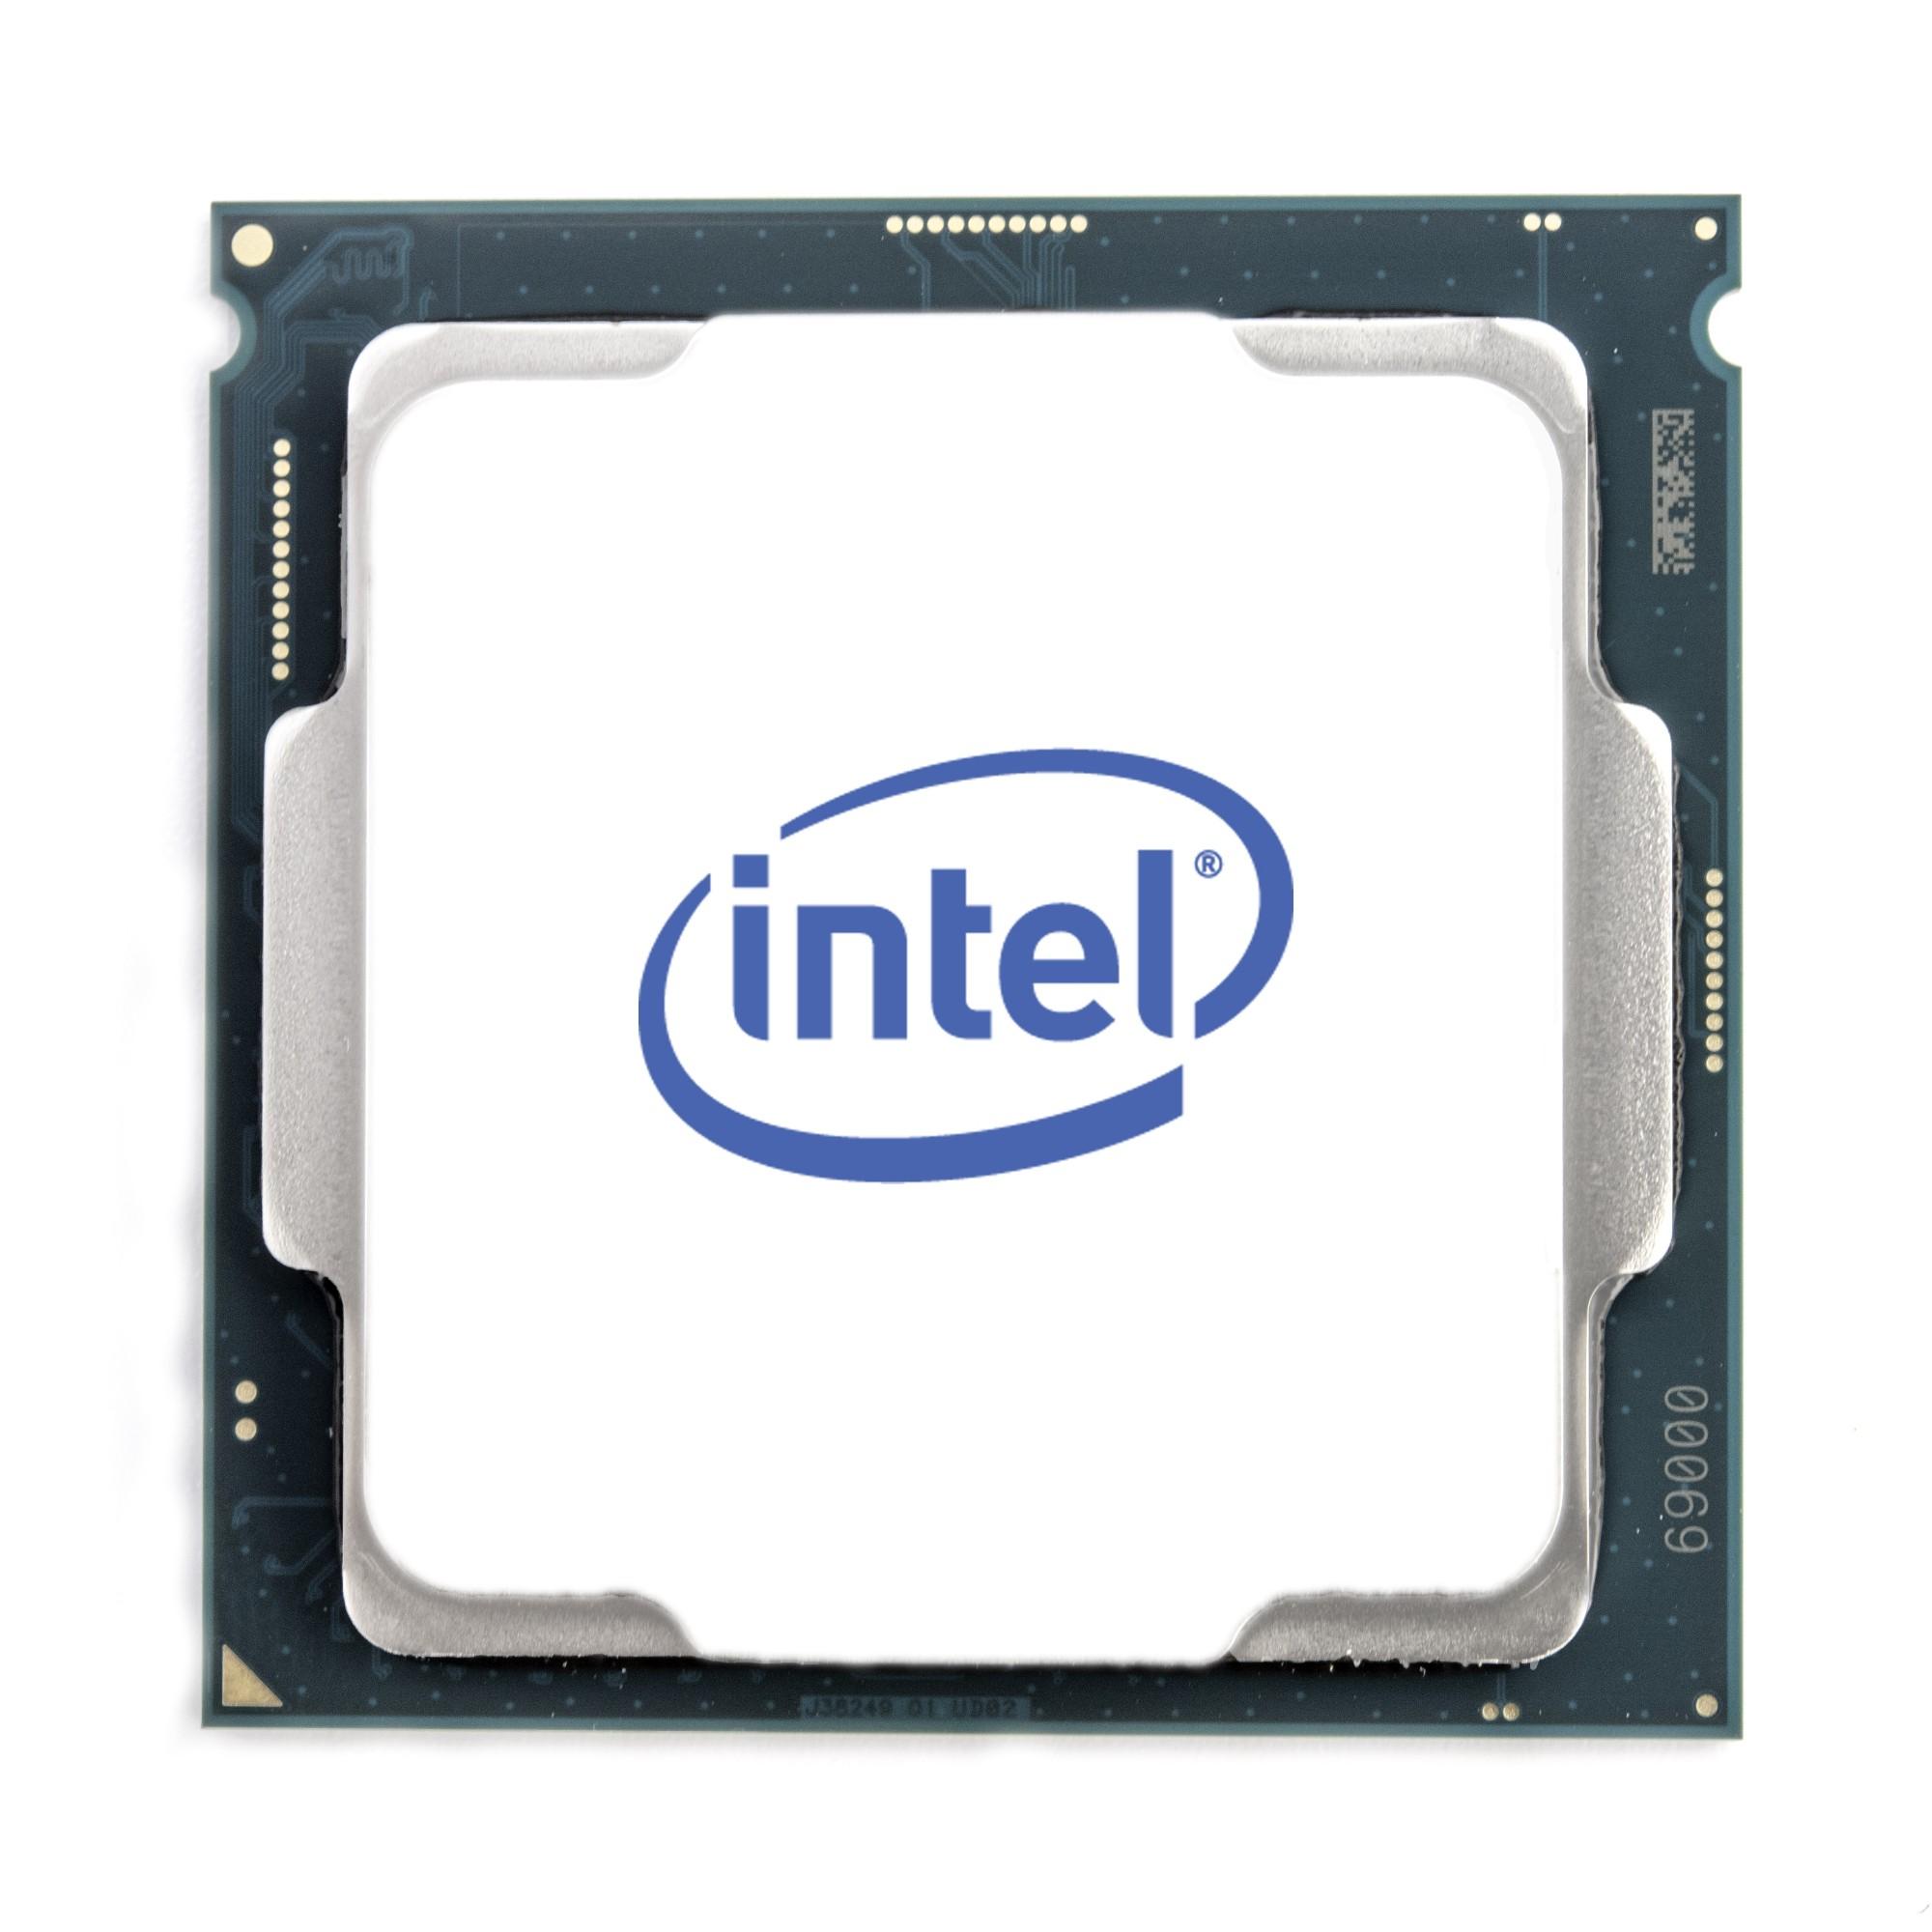 Intel Xeon 5218 processor 2.3 GHz 22 MB